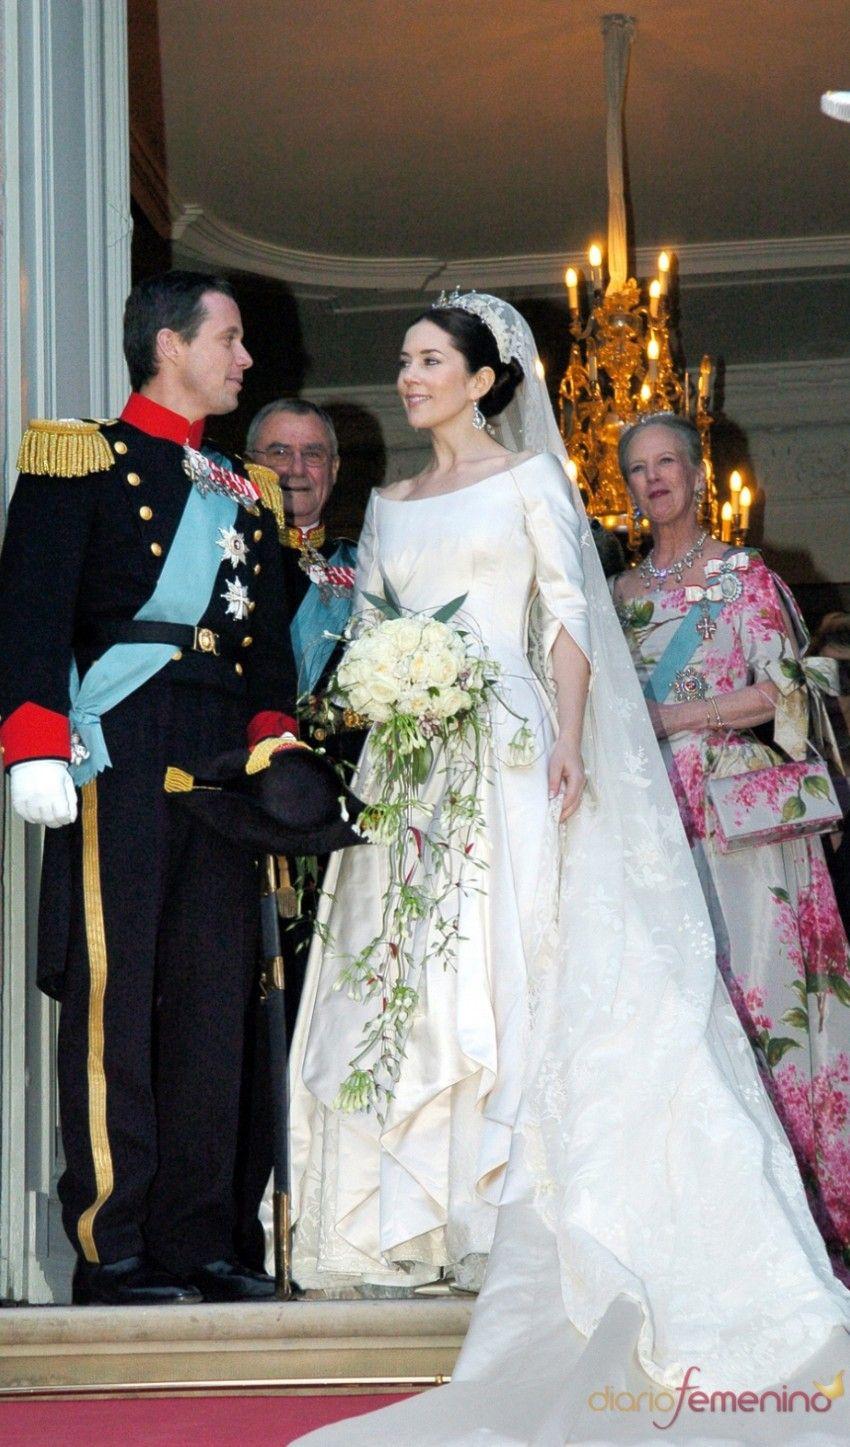 Pin By M Ferreira On Princess Mary Royal Wedding Dress Royal Brides Royal Weddings [ 1447 x 850 Pixel ]